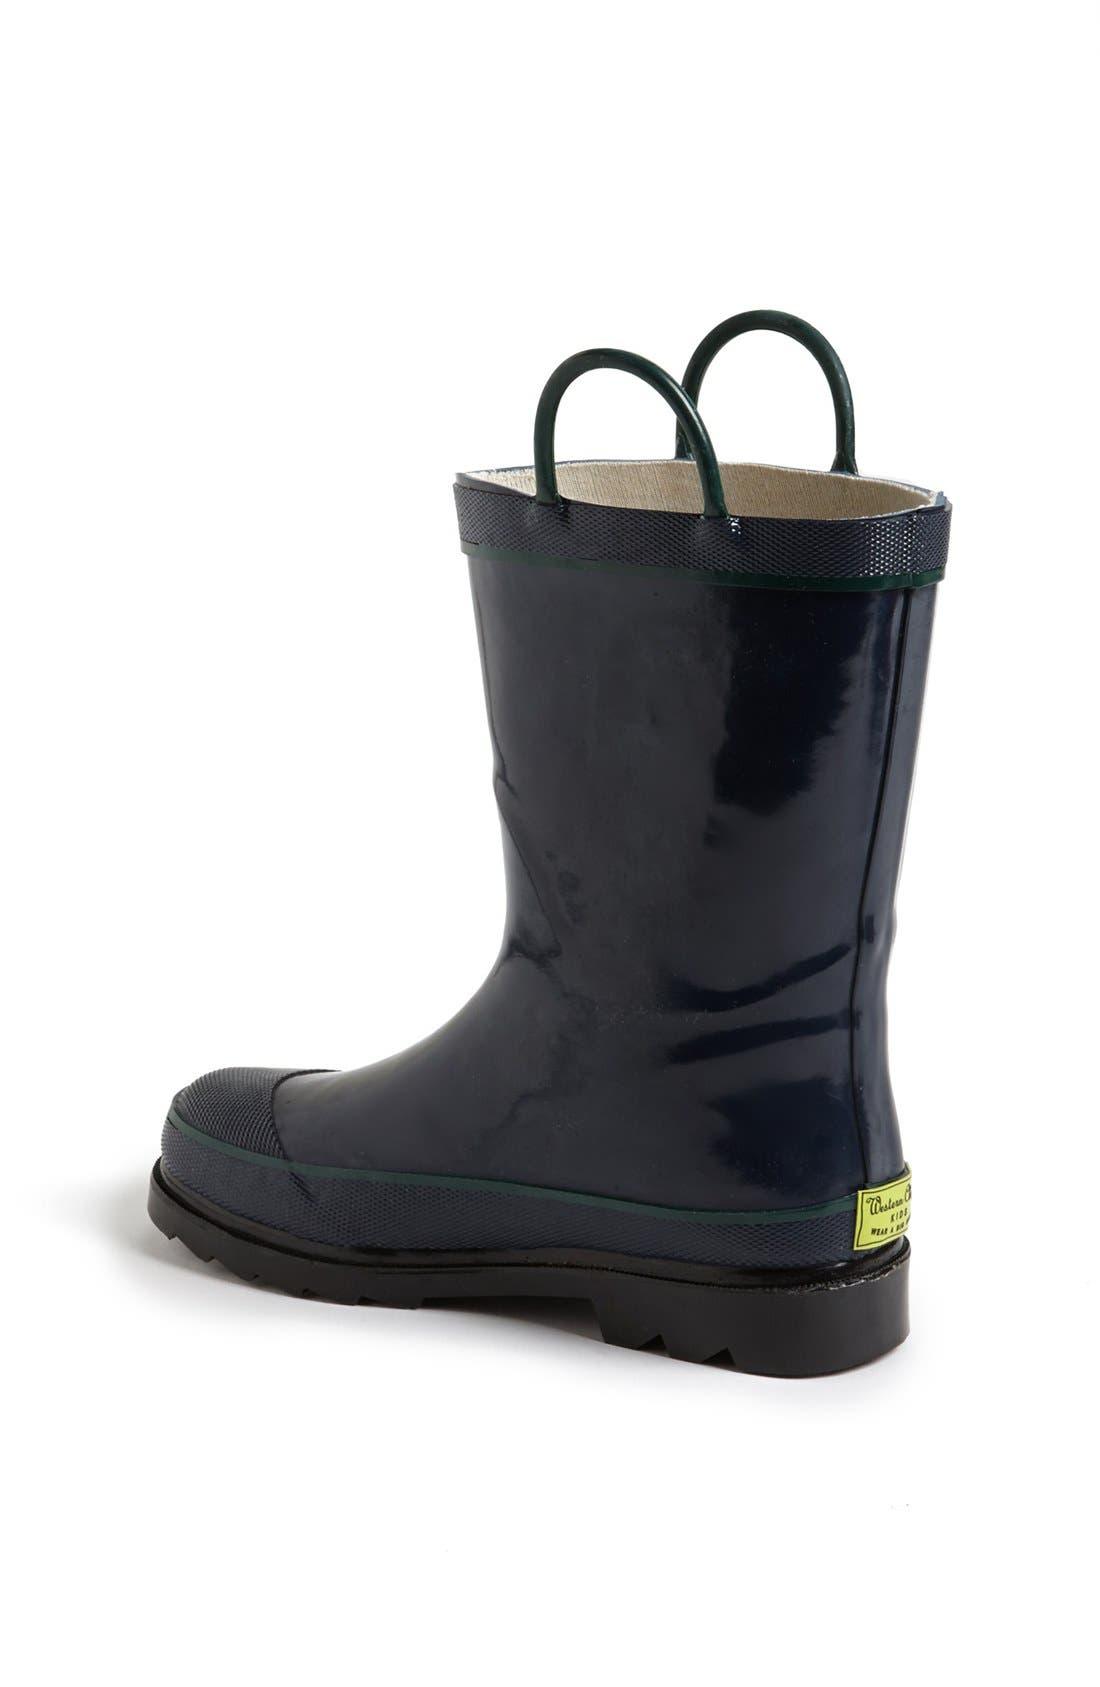 WESTERN CHIEF, Firechief 2 Waterproof Rain Boot, Alternate thumbnail 3, color, NAVY